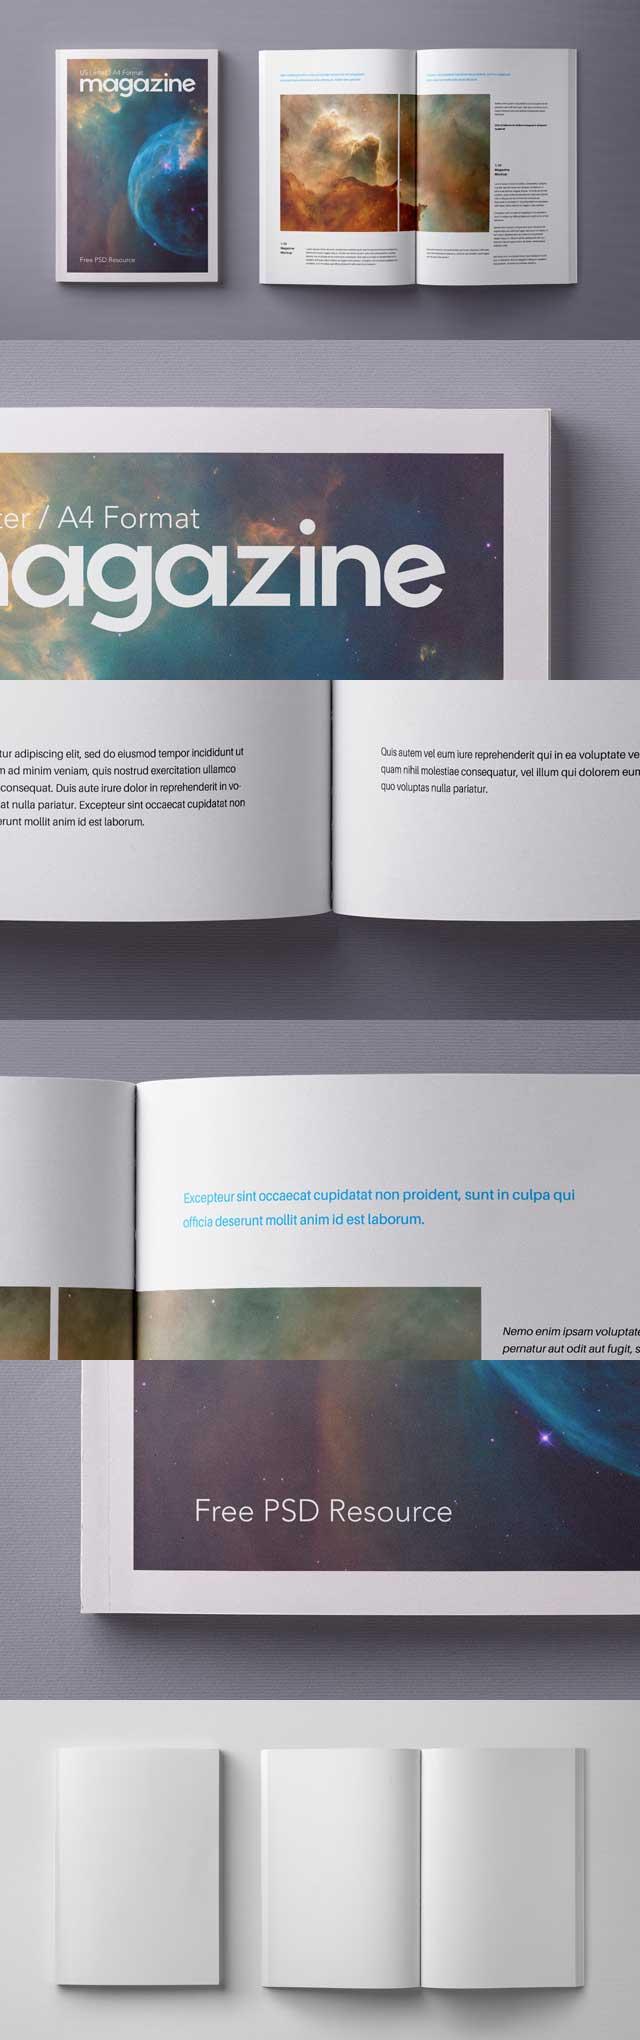 Free-A4-Magazine-Mockup-Template-Psd